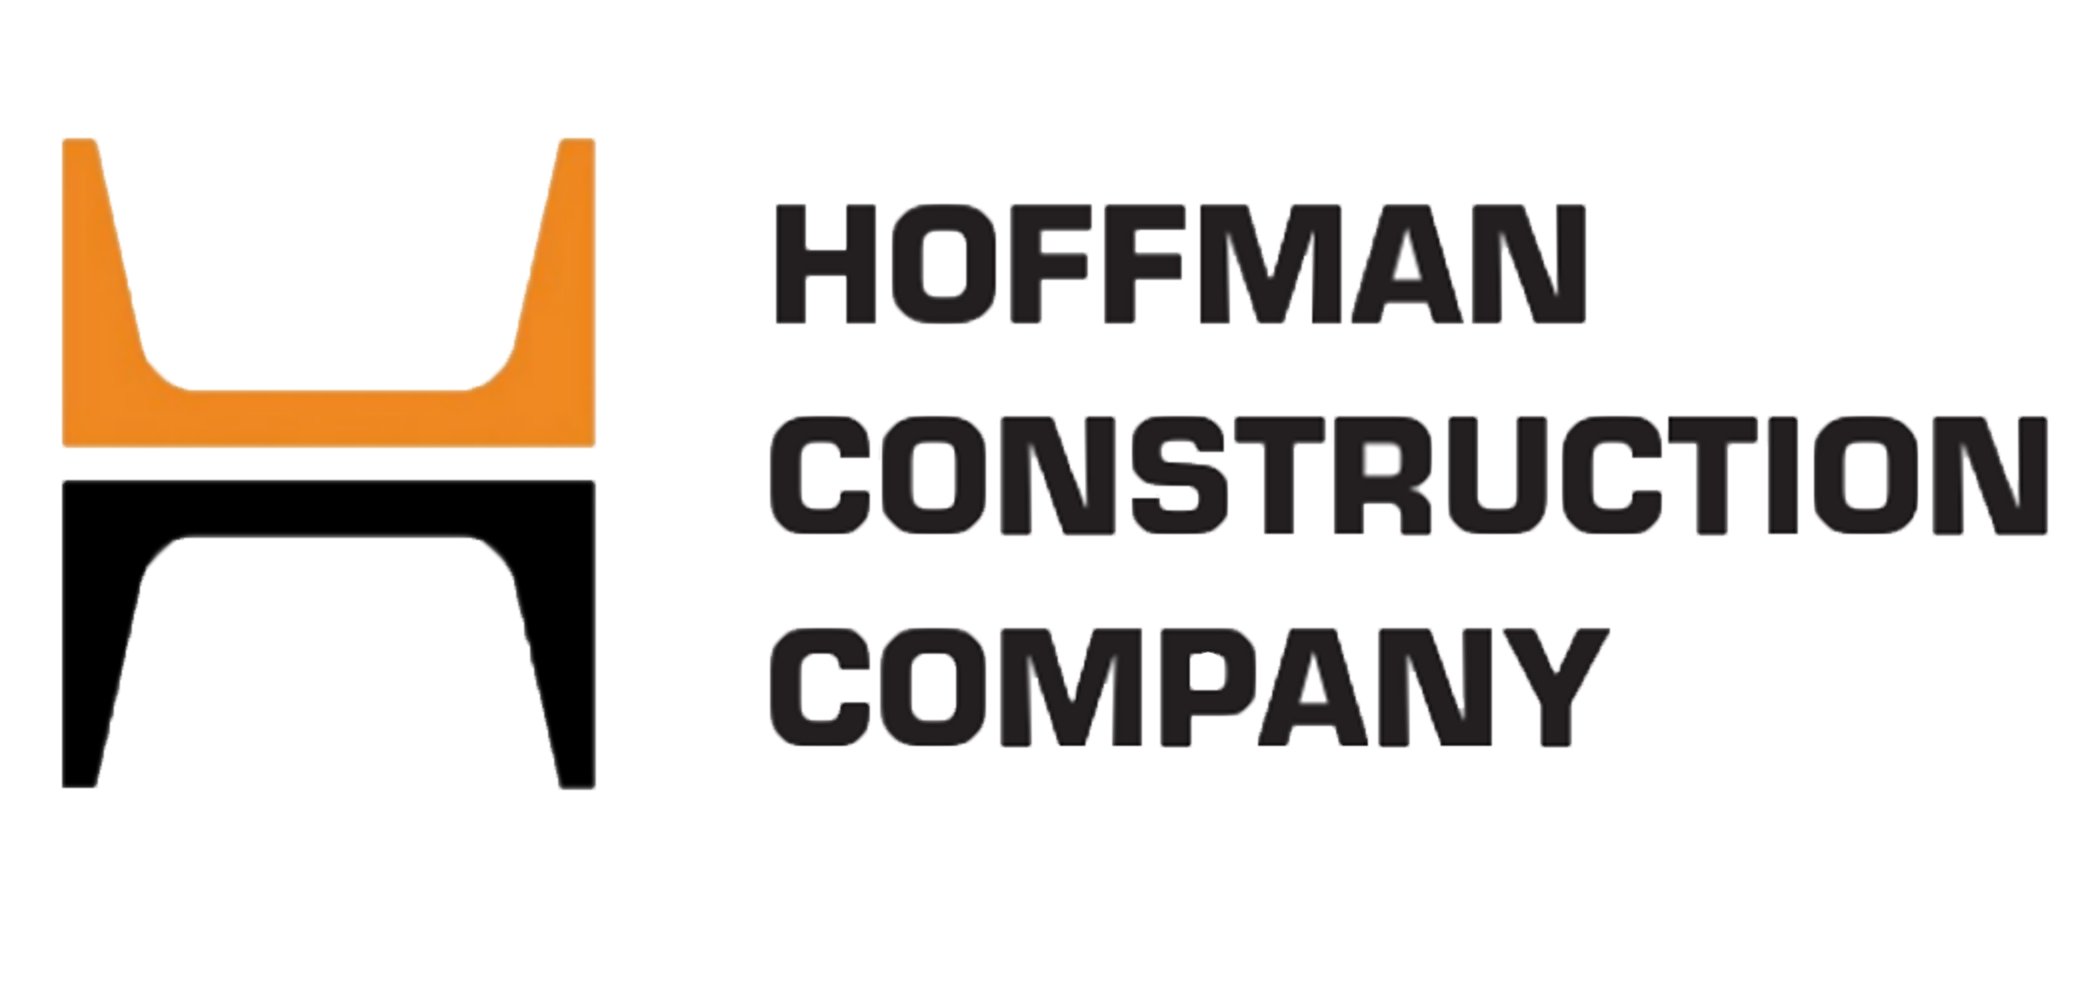 Hoffman Construction Company